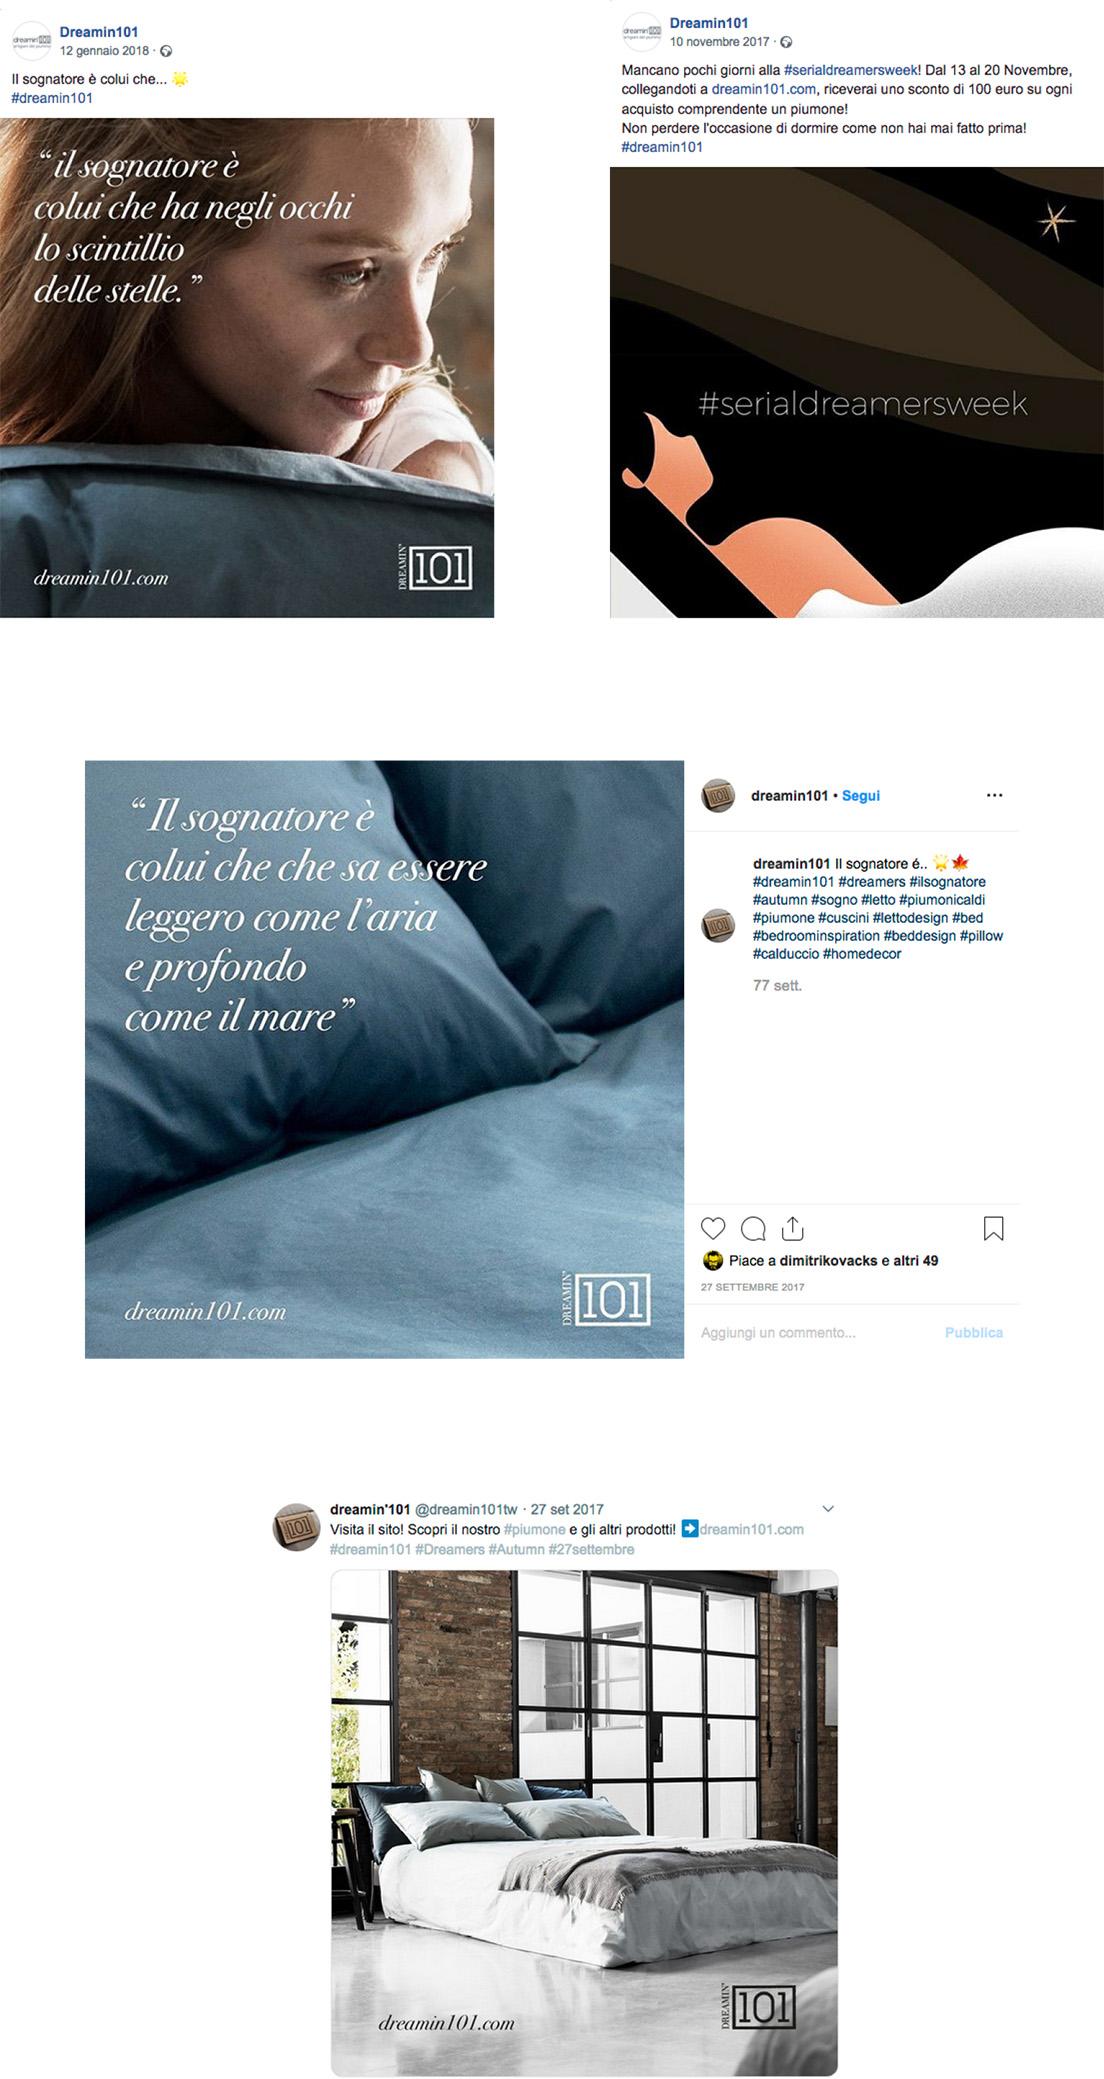 Menabò - Dreamin 101 social